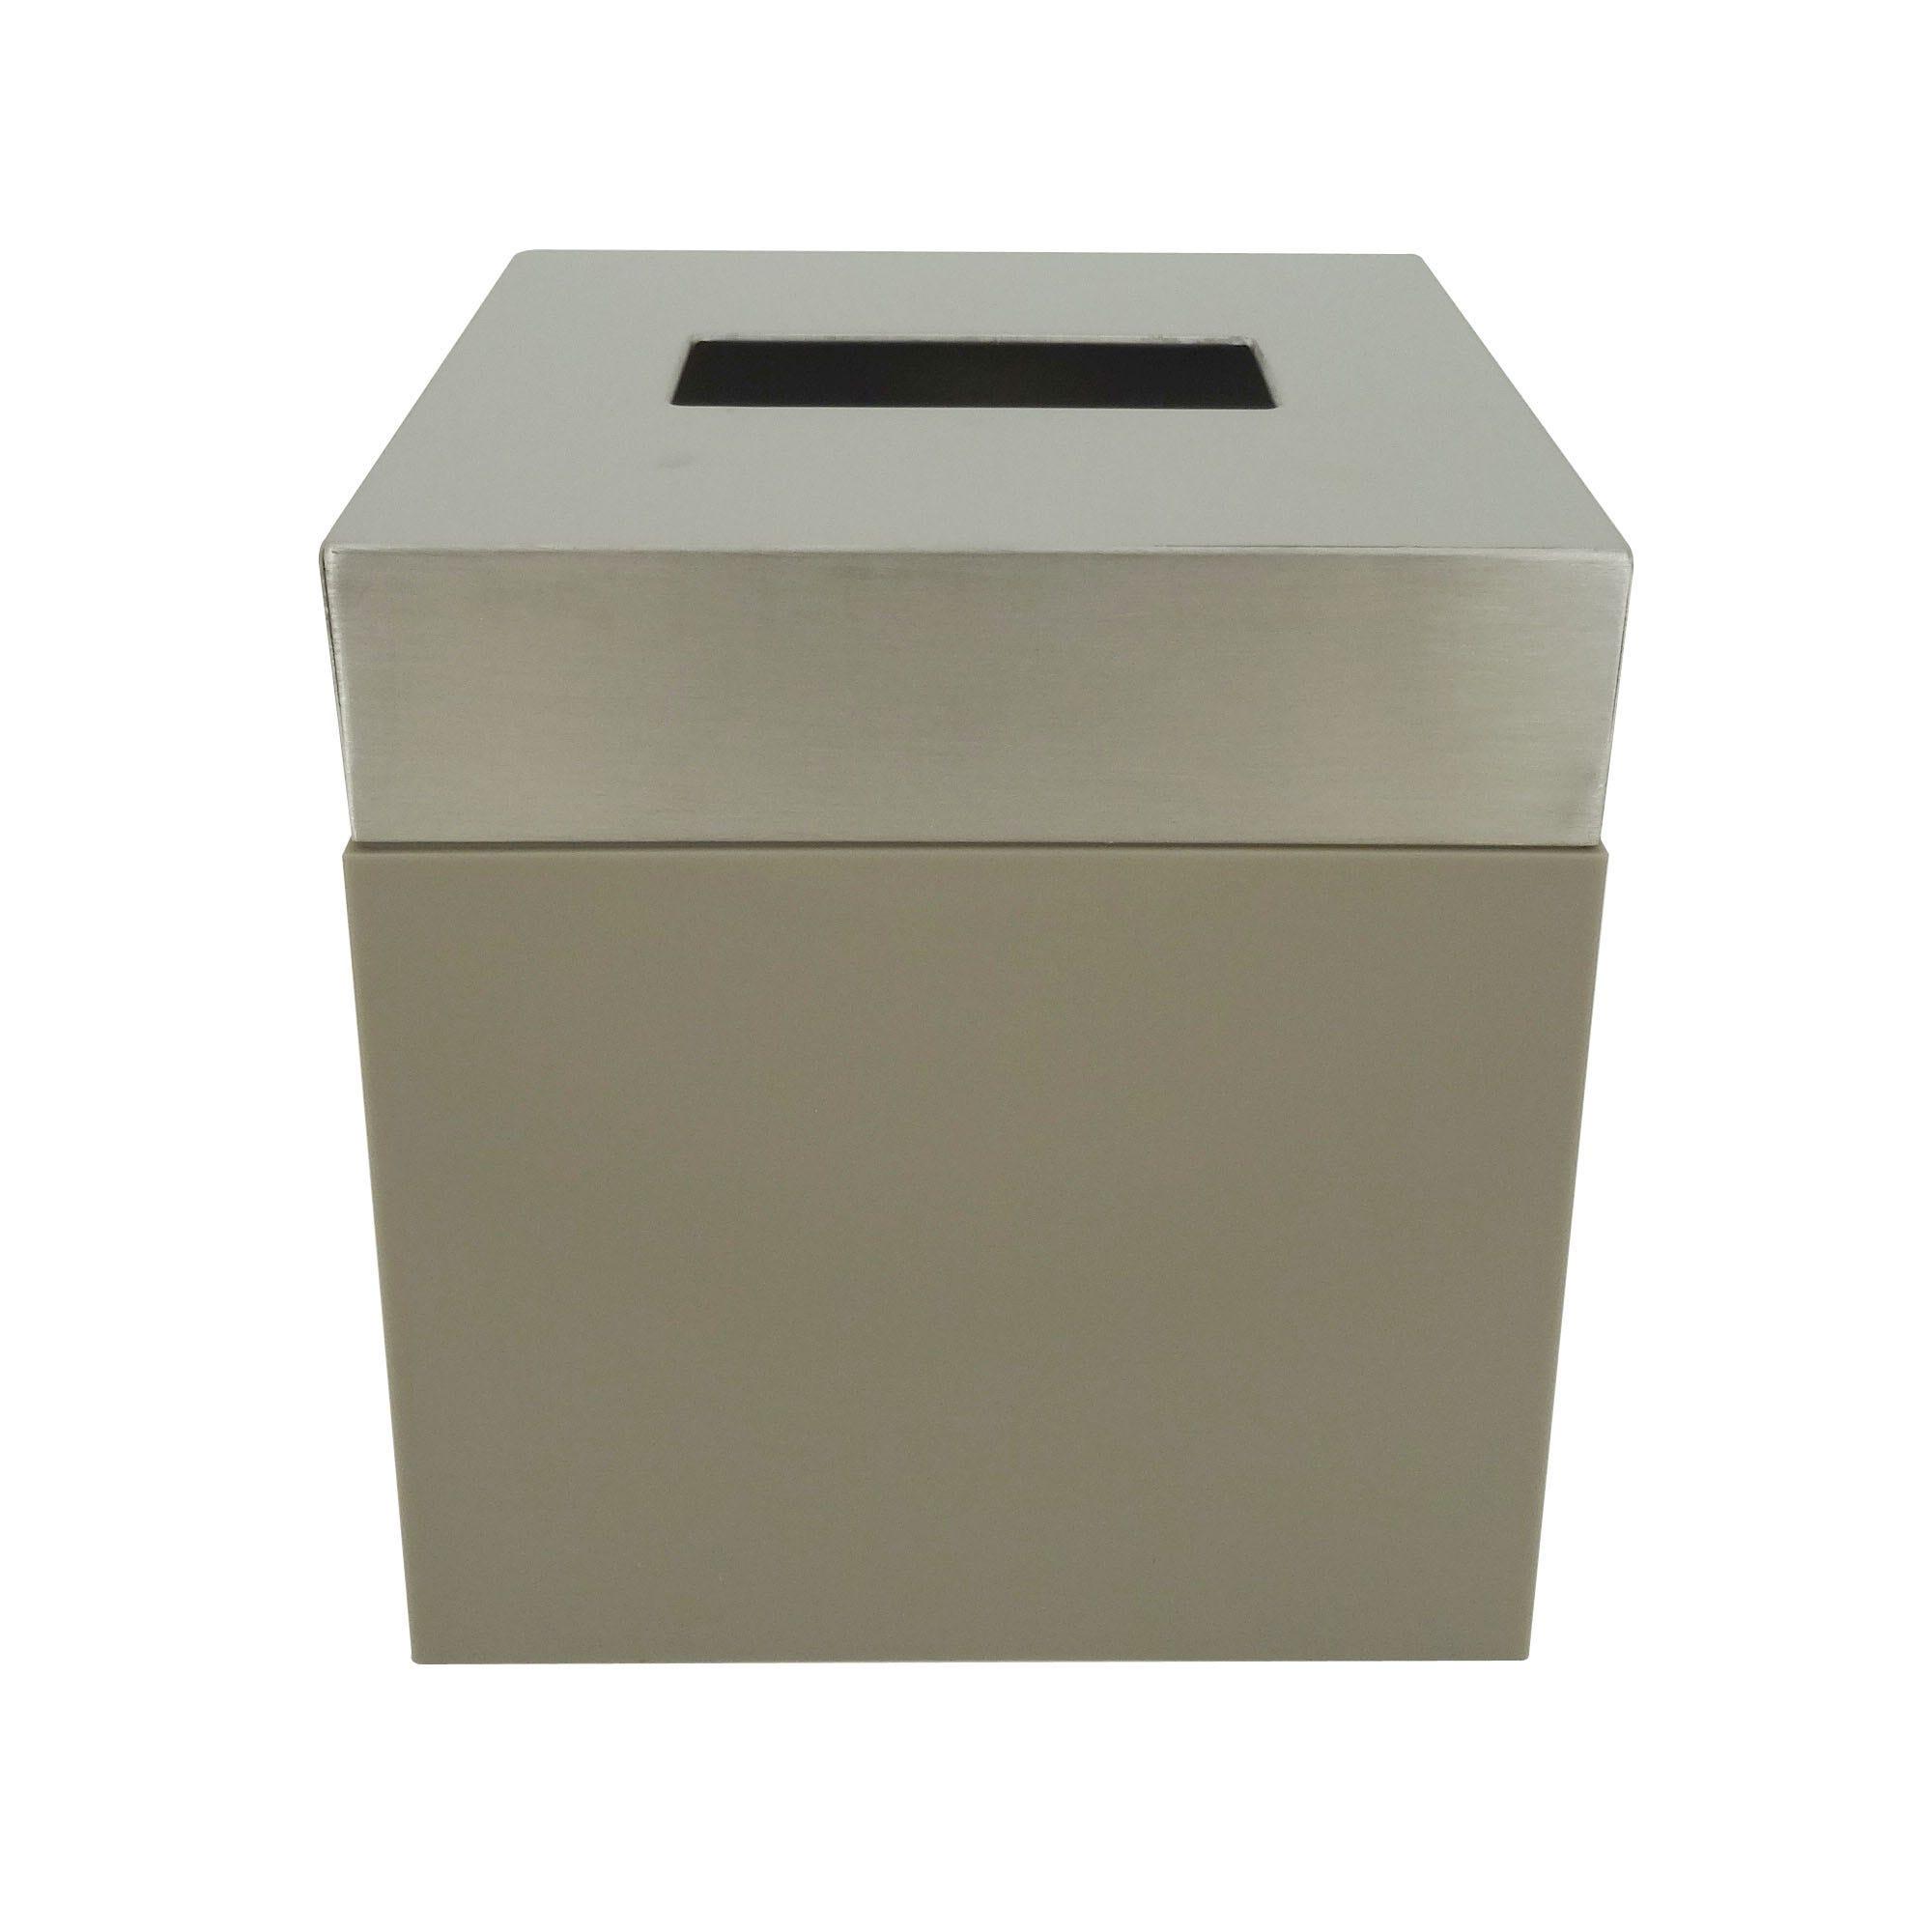 Namaro Design Dispensador de pañuelos desechables en gris